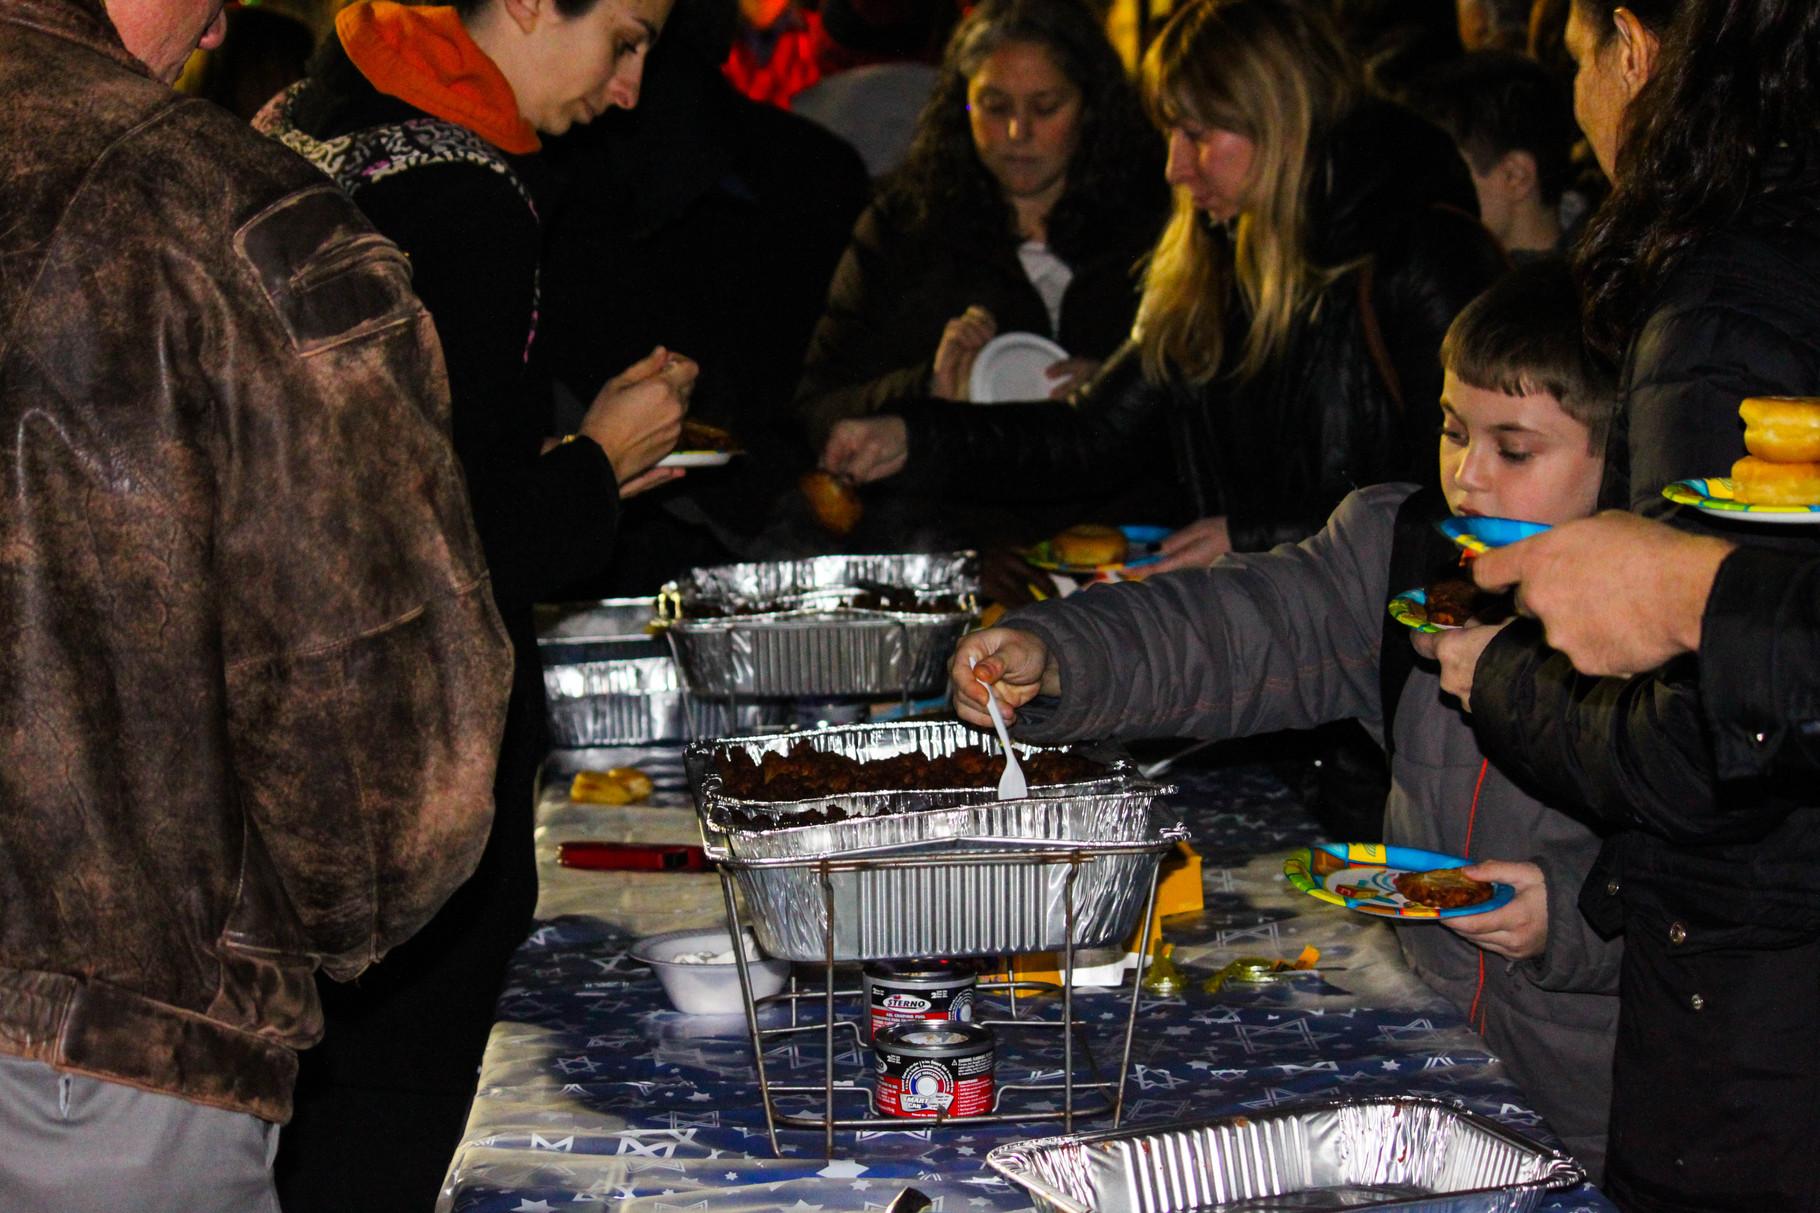 Residents enjoy hot latkes and donuts